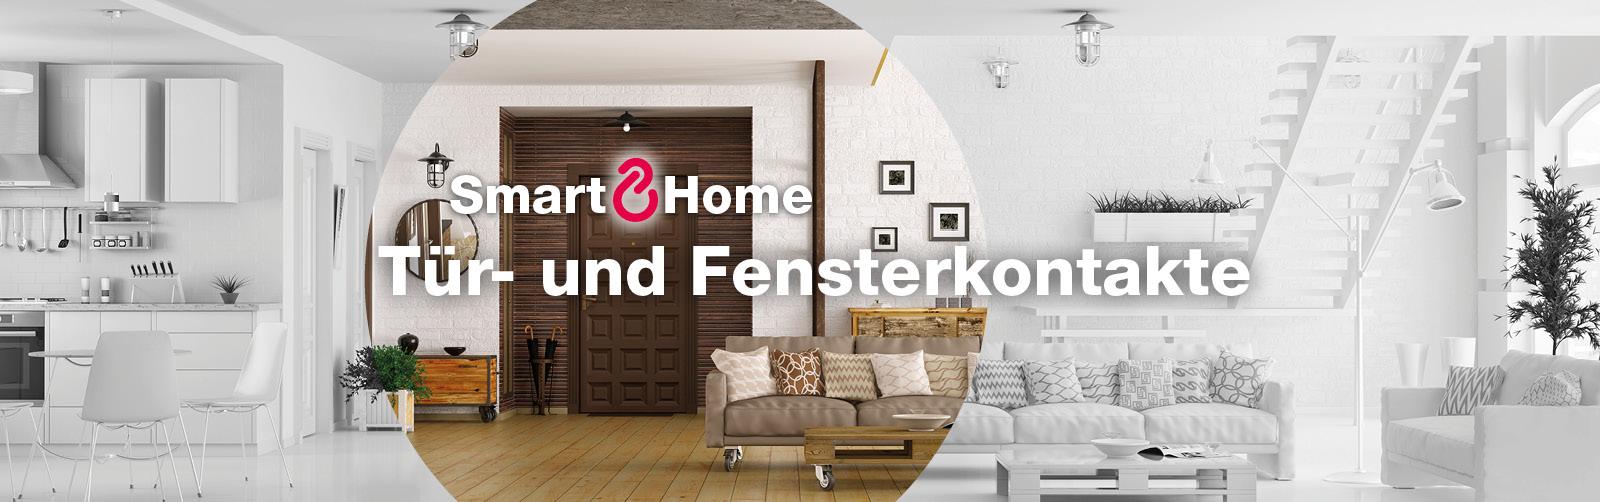 smart home t r und fensterkontakte blog electronicpartner electronicpartner deutschland. Black Bedroom Furniture Sets. Home Design Ideas